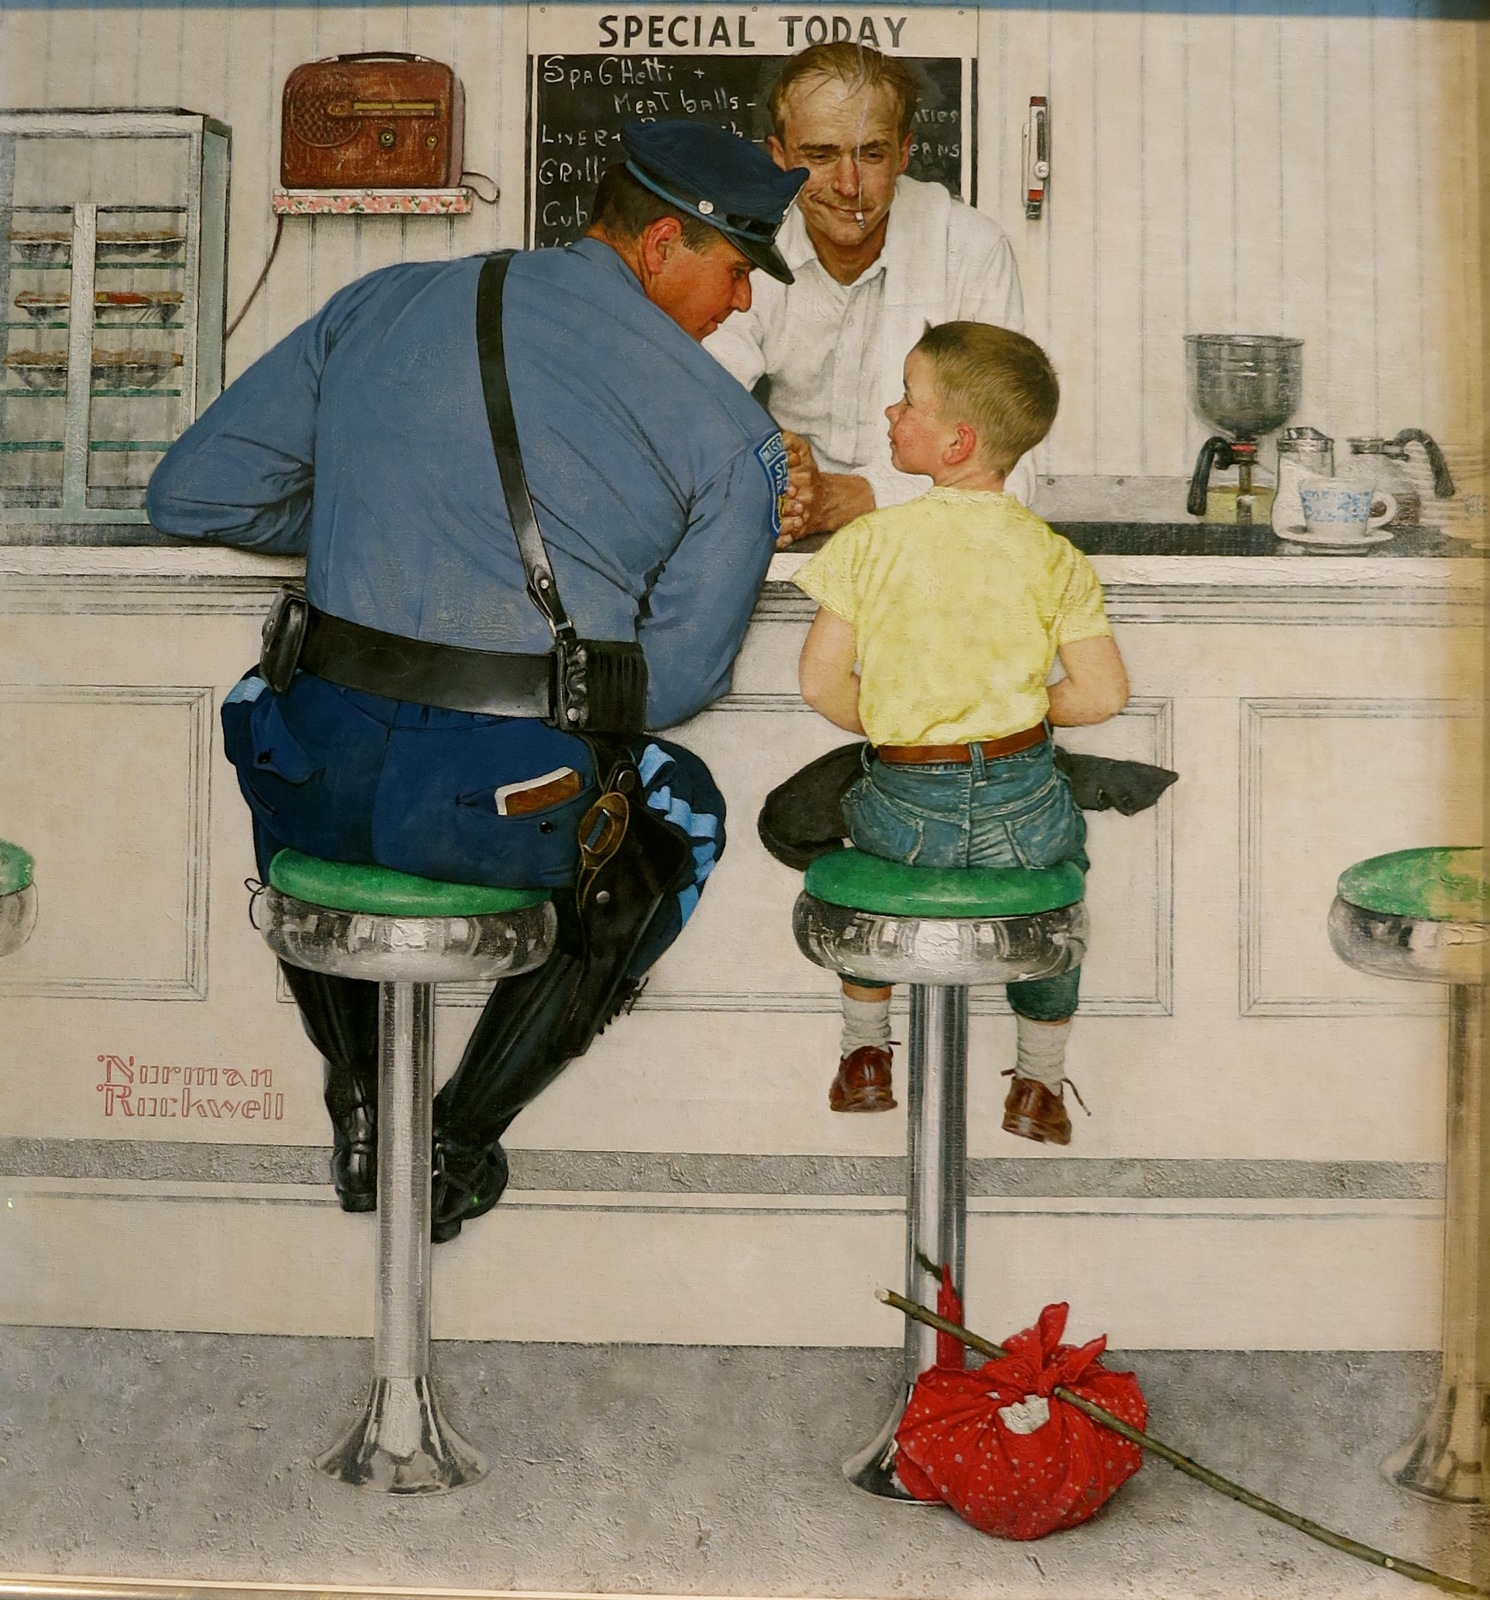 Norman Rockwells Famous cop and runaway boy illustration Norman Rockwell Museum Stockbridge MA